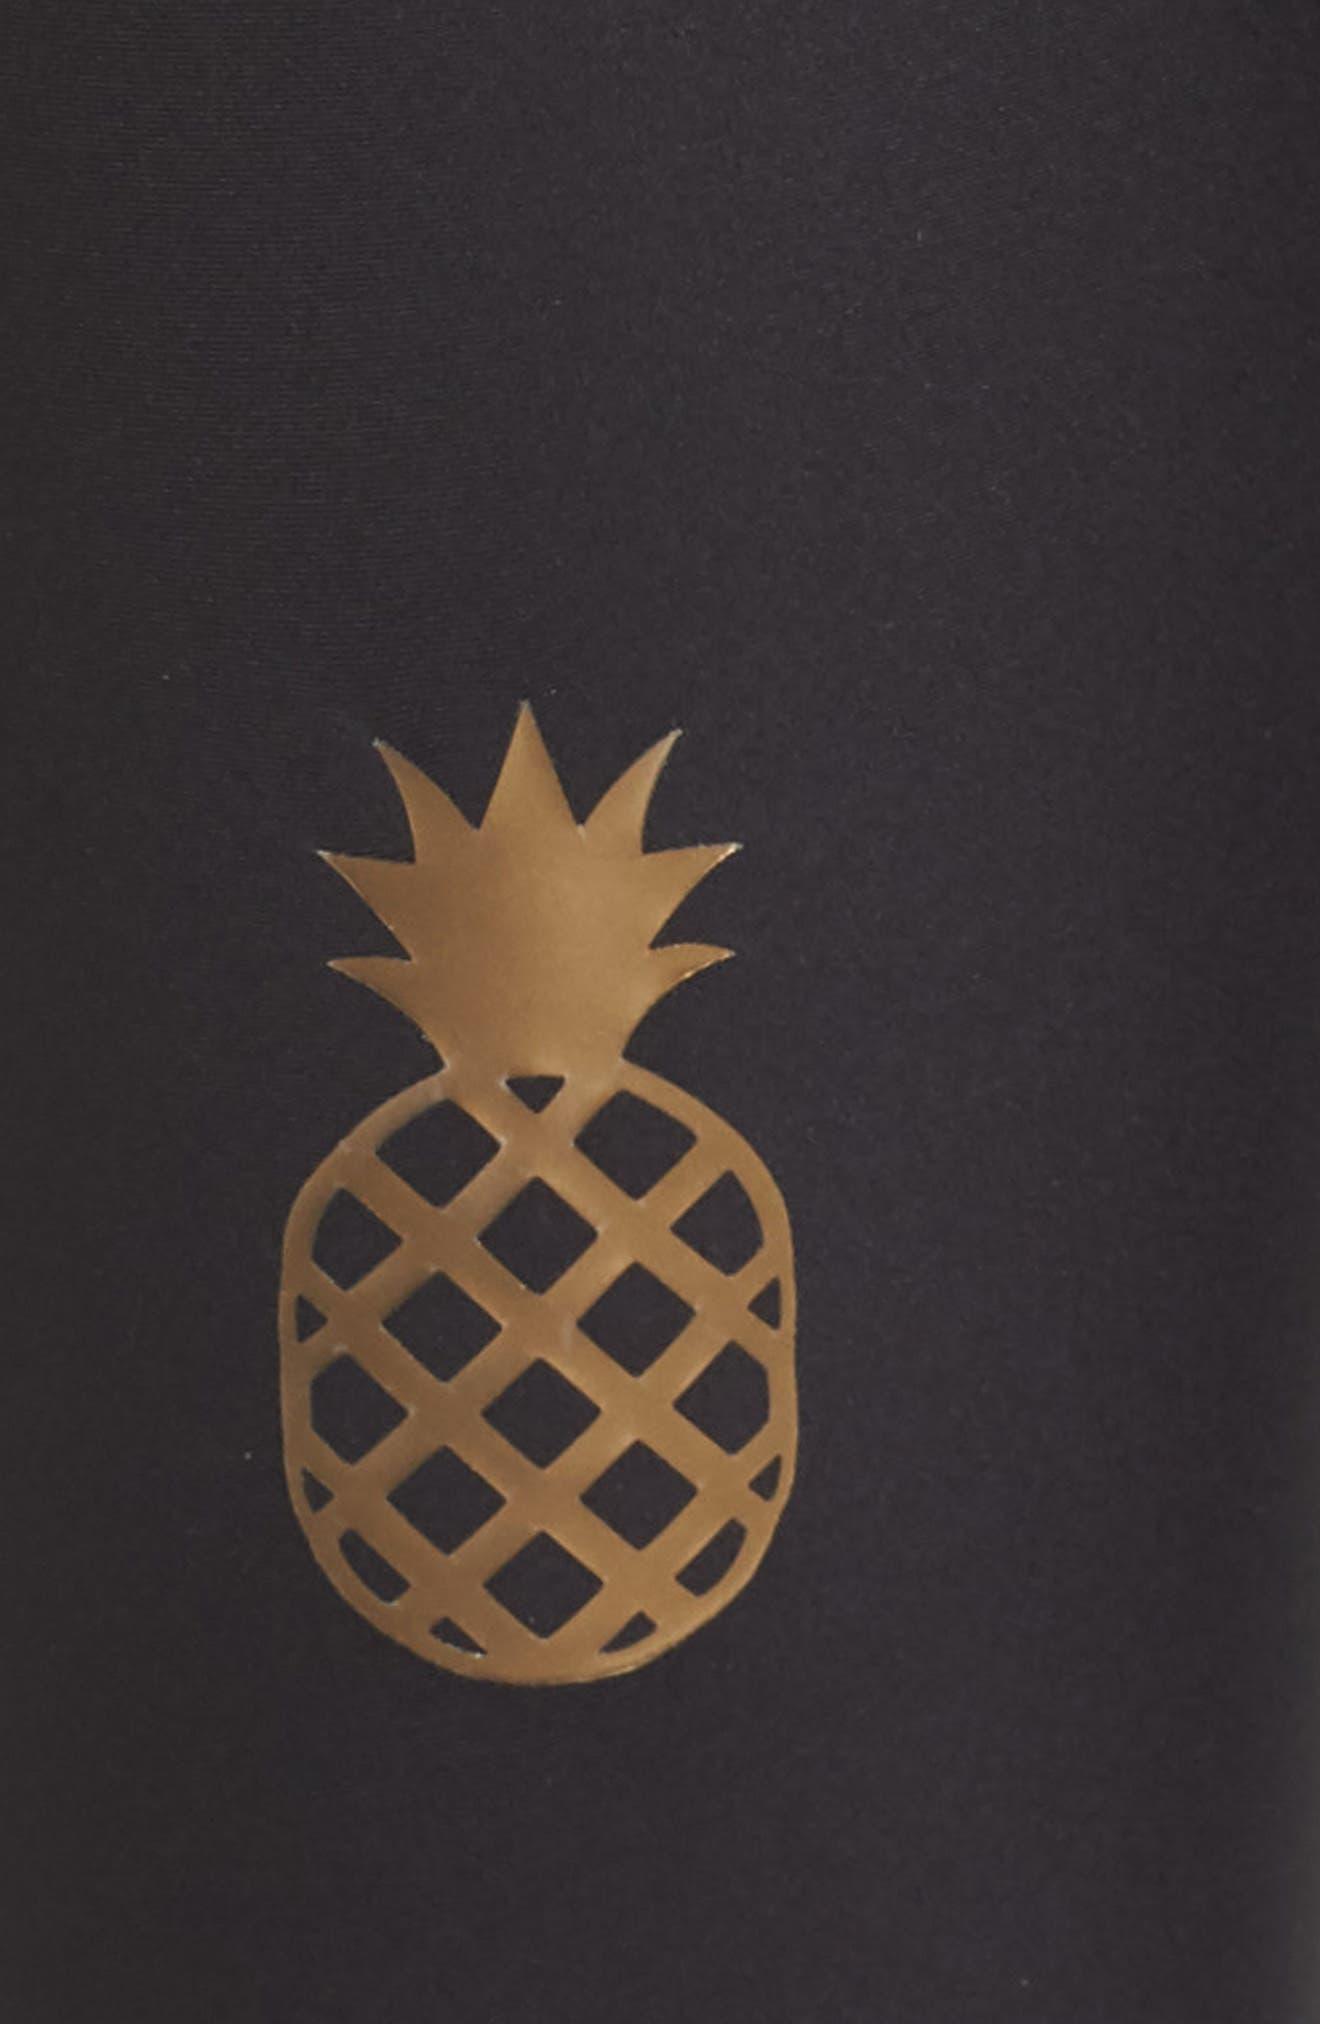 Ultra Pineapple Knockout Leggings,                             Alternate thumbnail 6, color,                             Nero/ Iridescent Gold